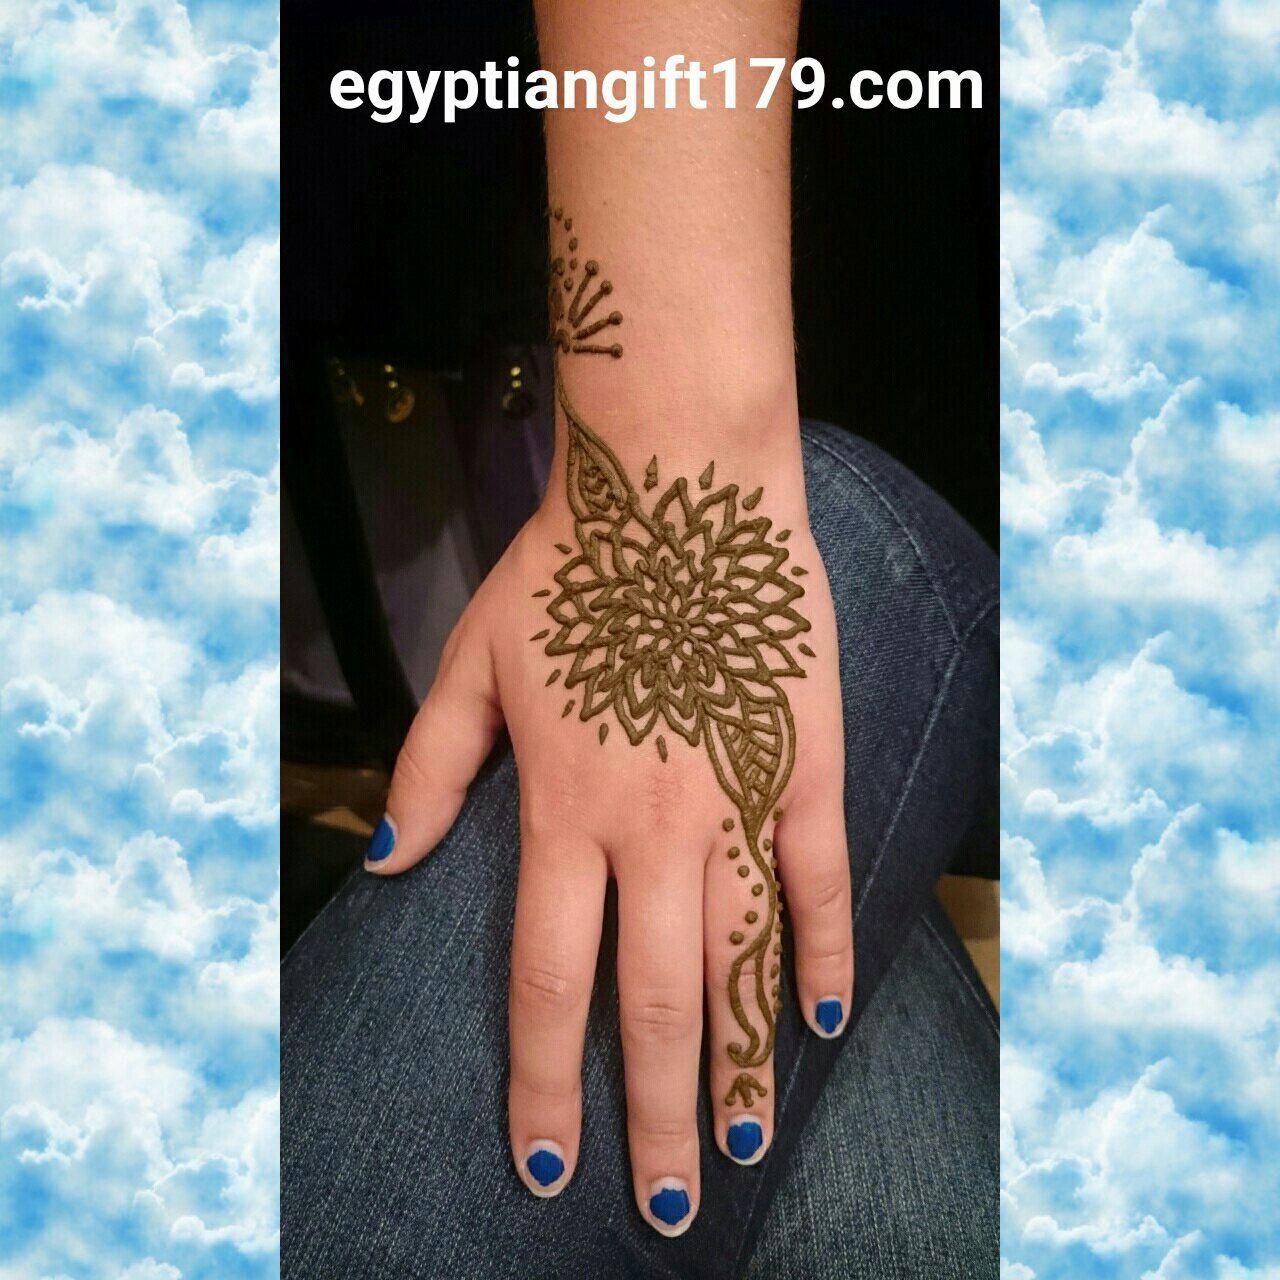 Egyptian gift corner henna shop henna kit airbrush tattoo